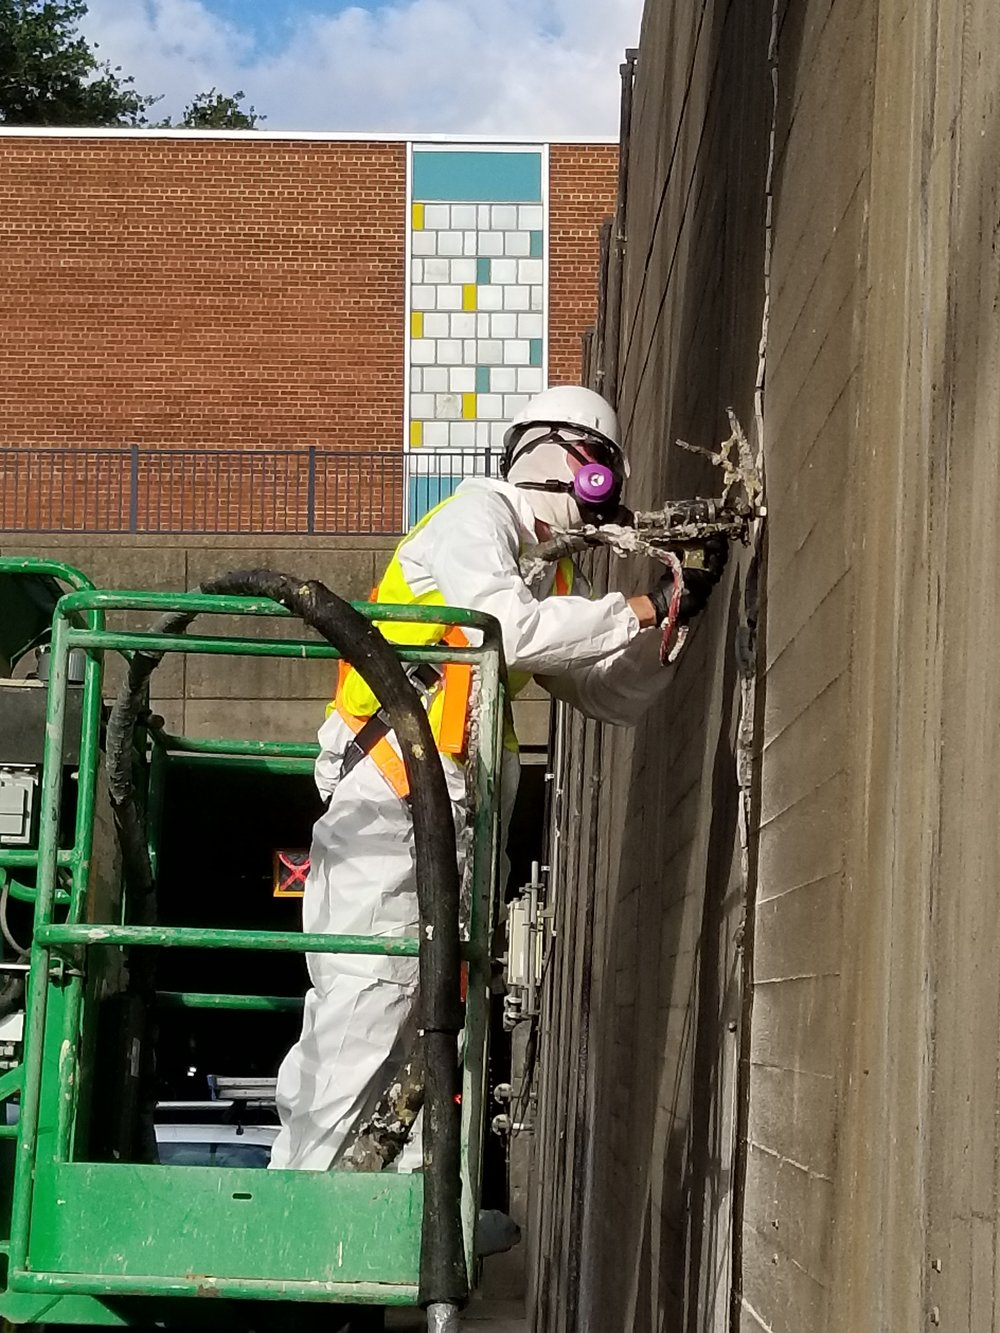 Midtown_Tunnel_Breach_Repairs_Portsmouth_VA